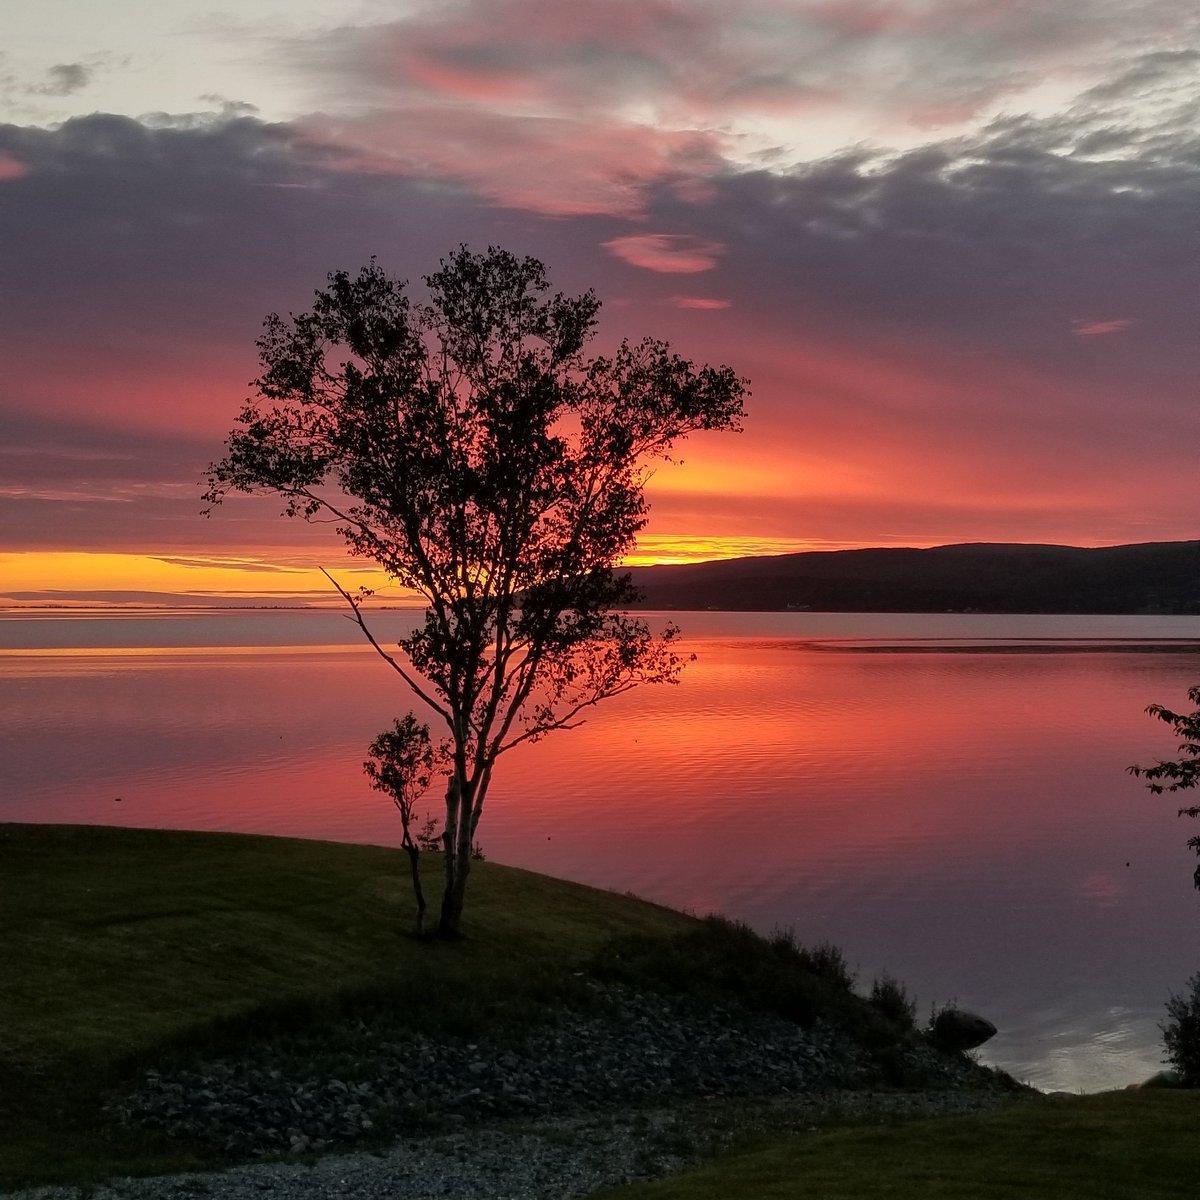 RT @2smalltowngirl: 5am. New day. Love my #island  #CapeBreton #sunrise #lighthouse #nature https://t.co/KL9jpkSFEb